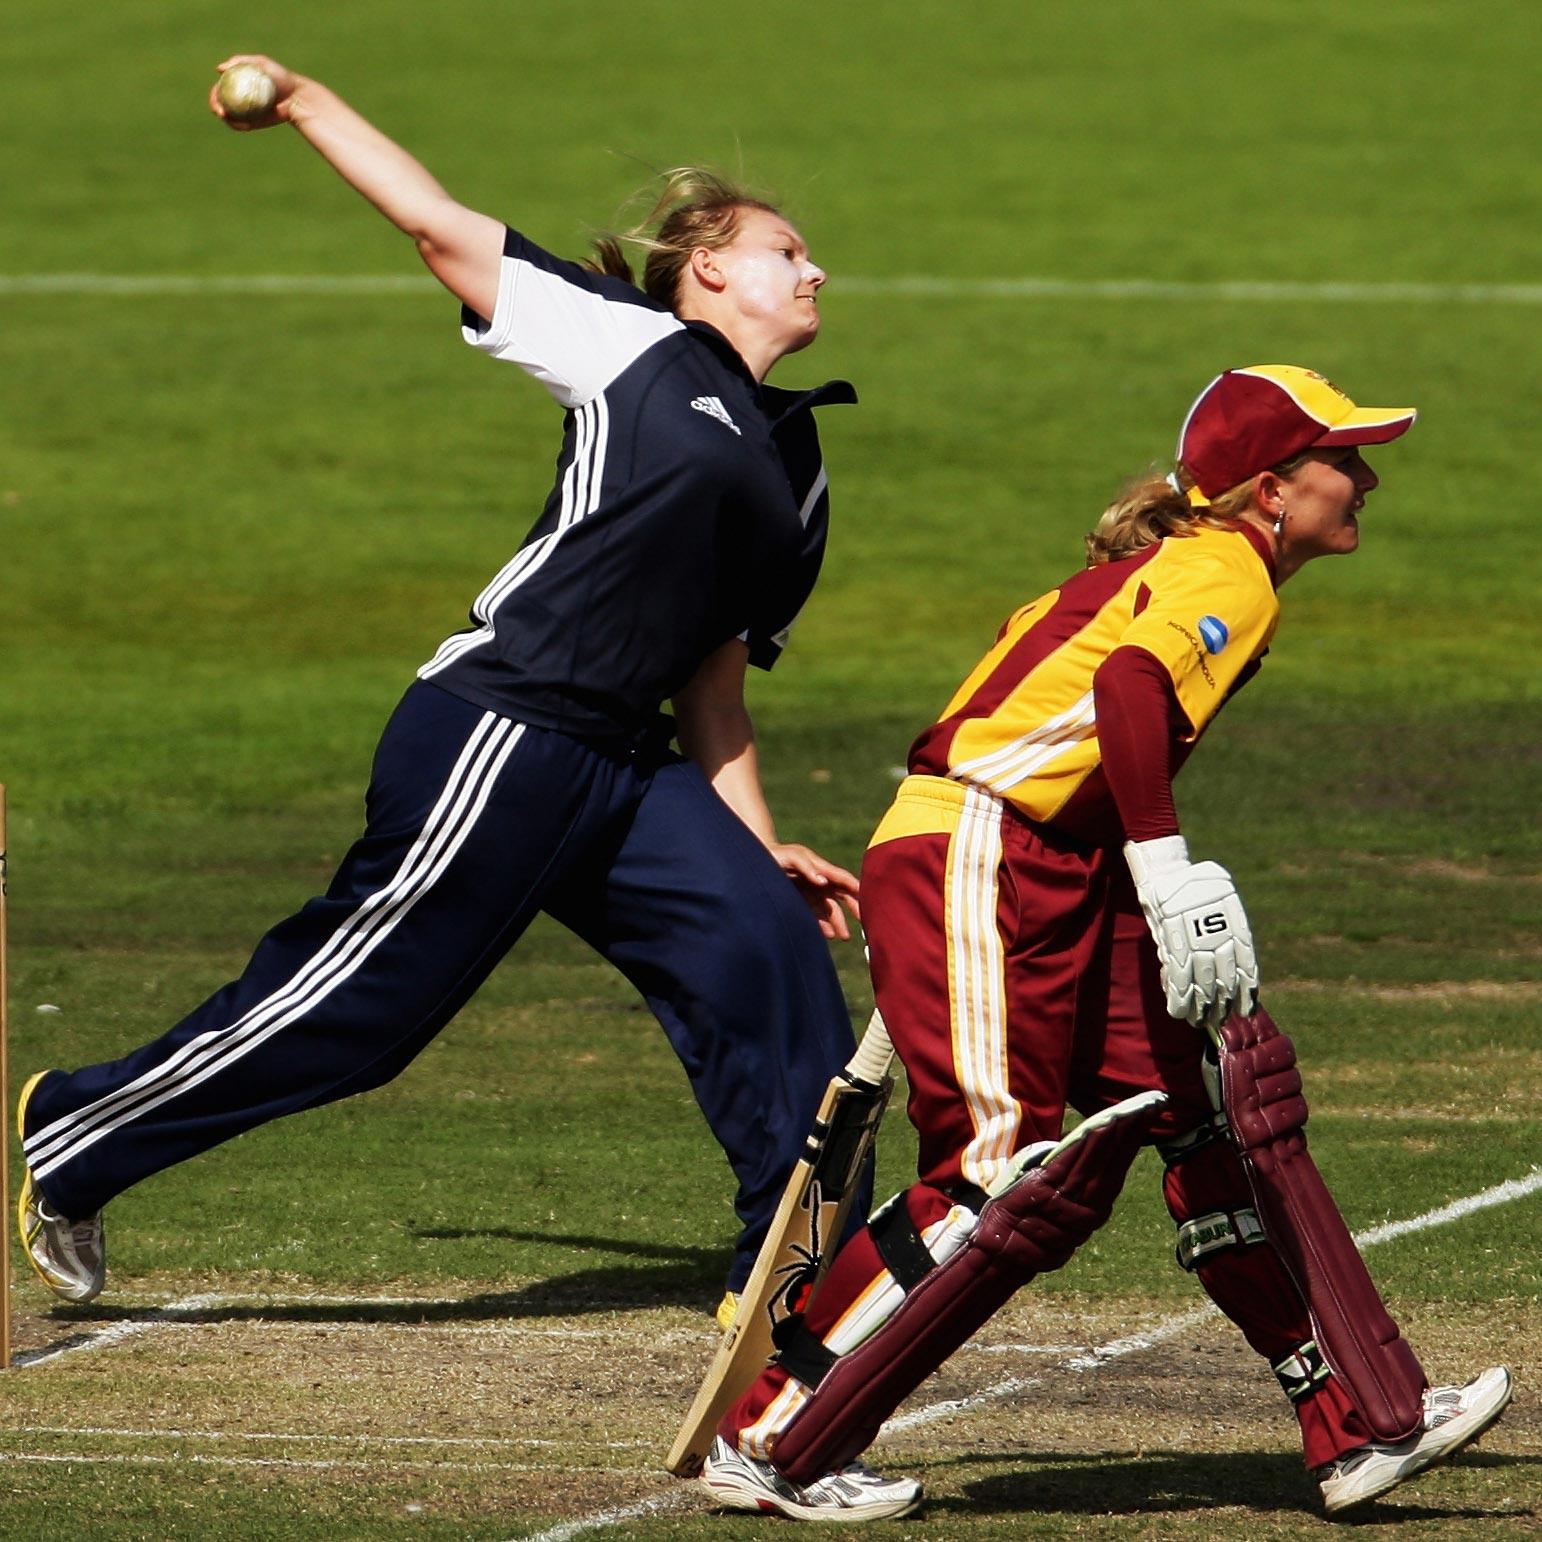 Victoria's Kristen Beams bowls against Queensland // Getty